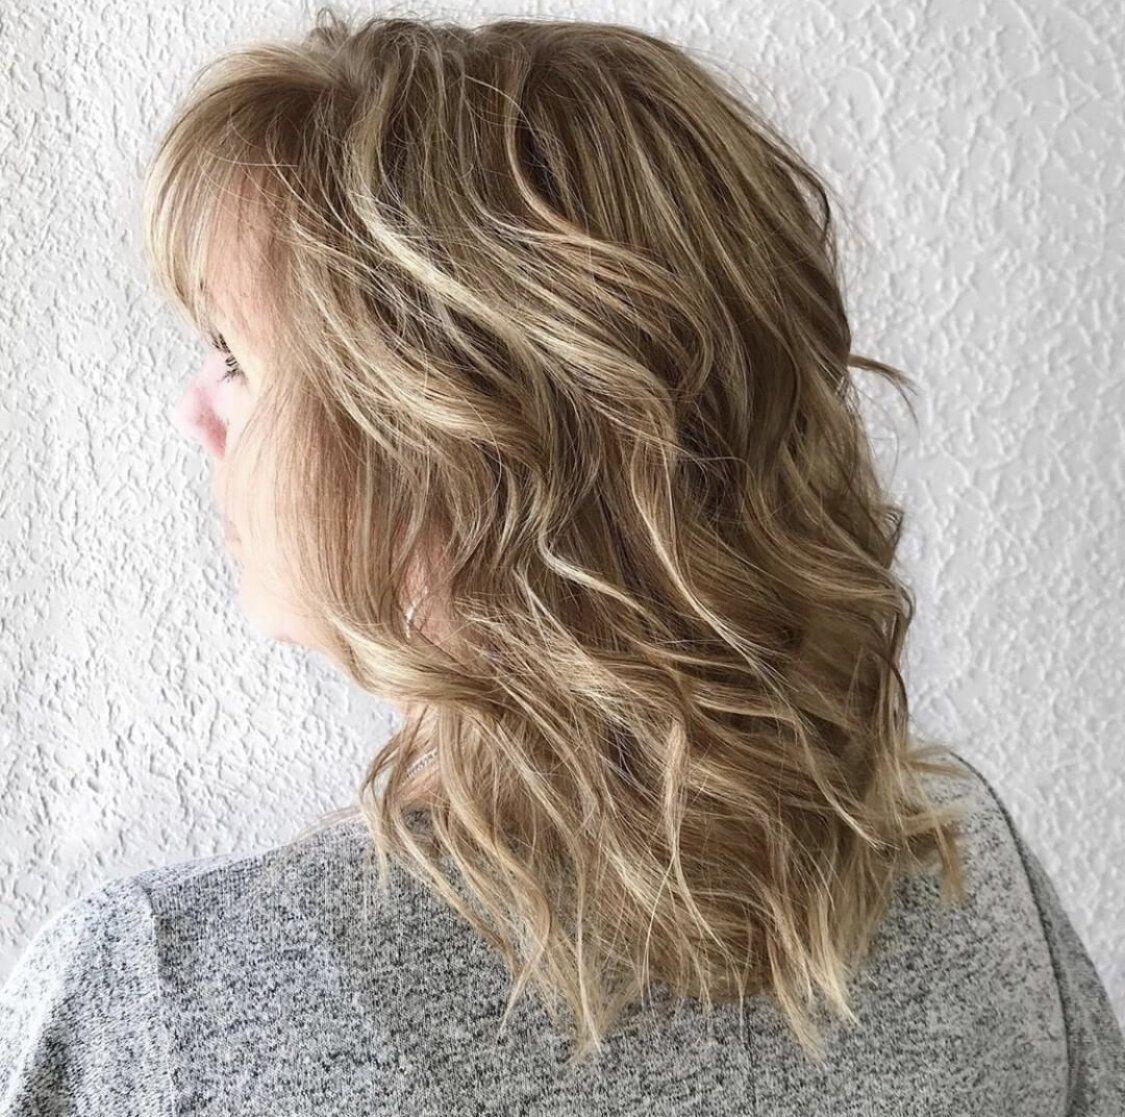 Curly Hairstyles Utah Hair Salon Curly Hair Styles Hair Styles Hair